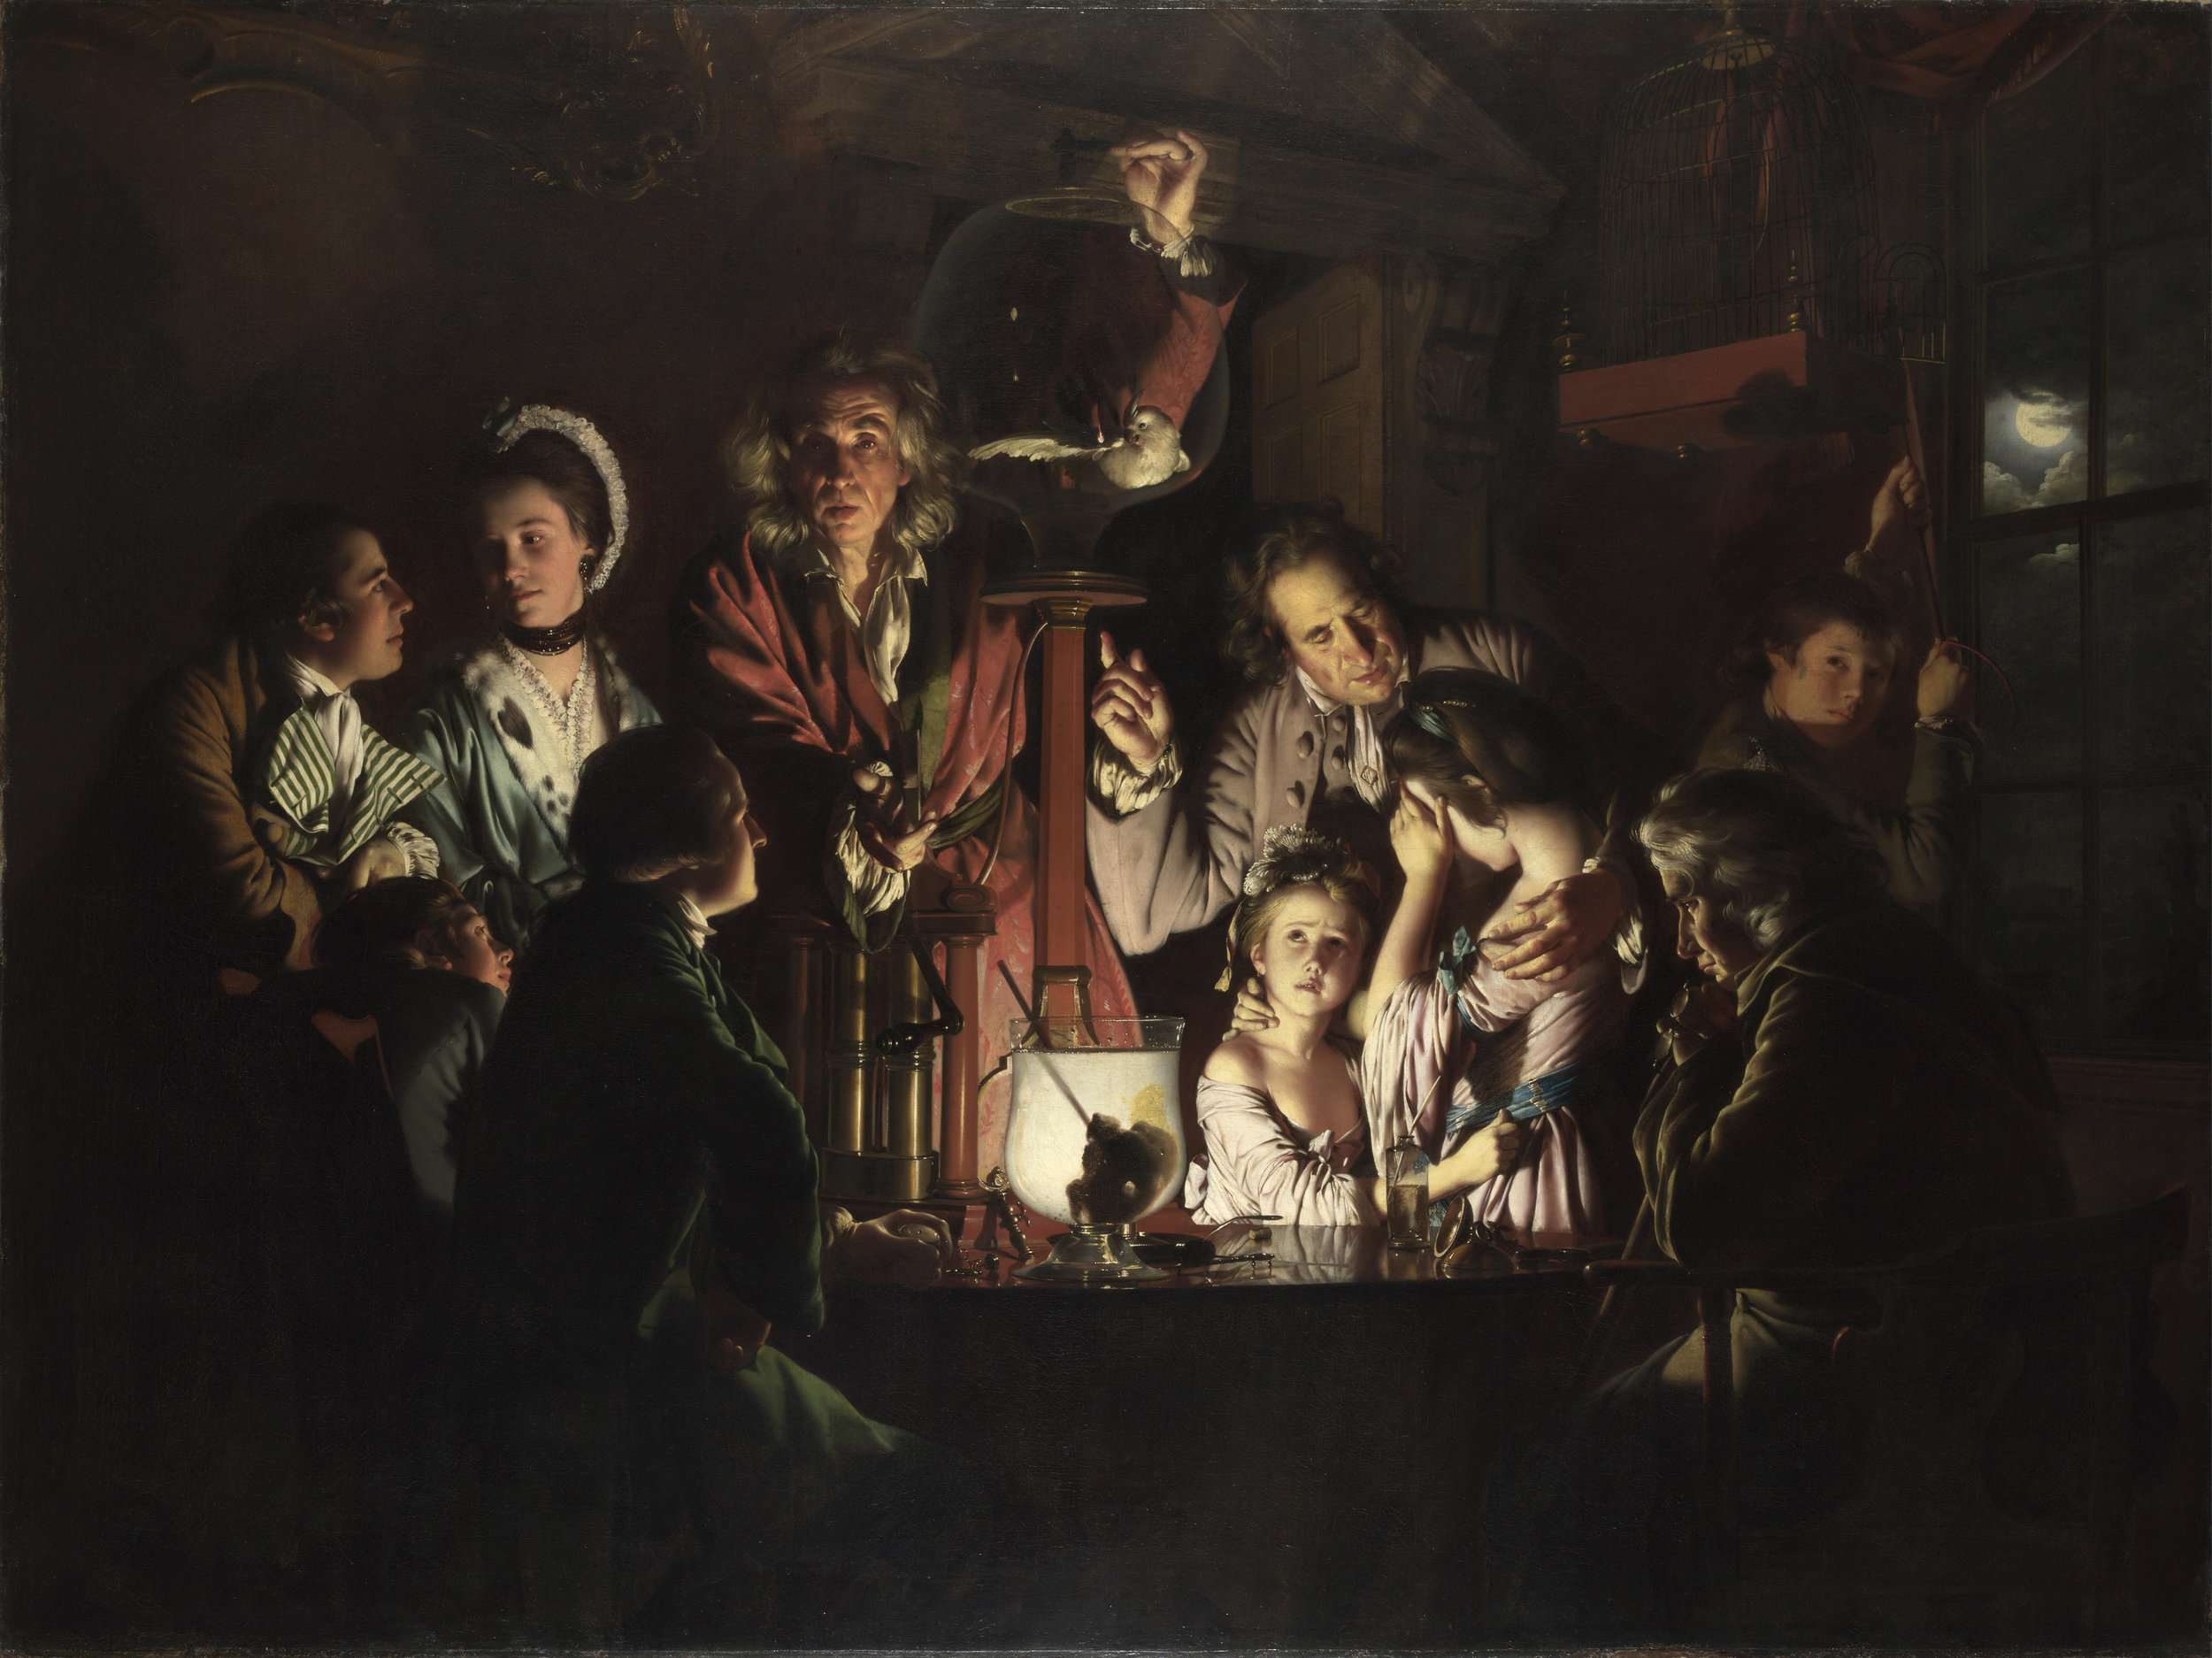 Joseph Wright de Derby: Experimento con pajarillo y bomba de aire, 1768.